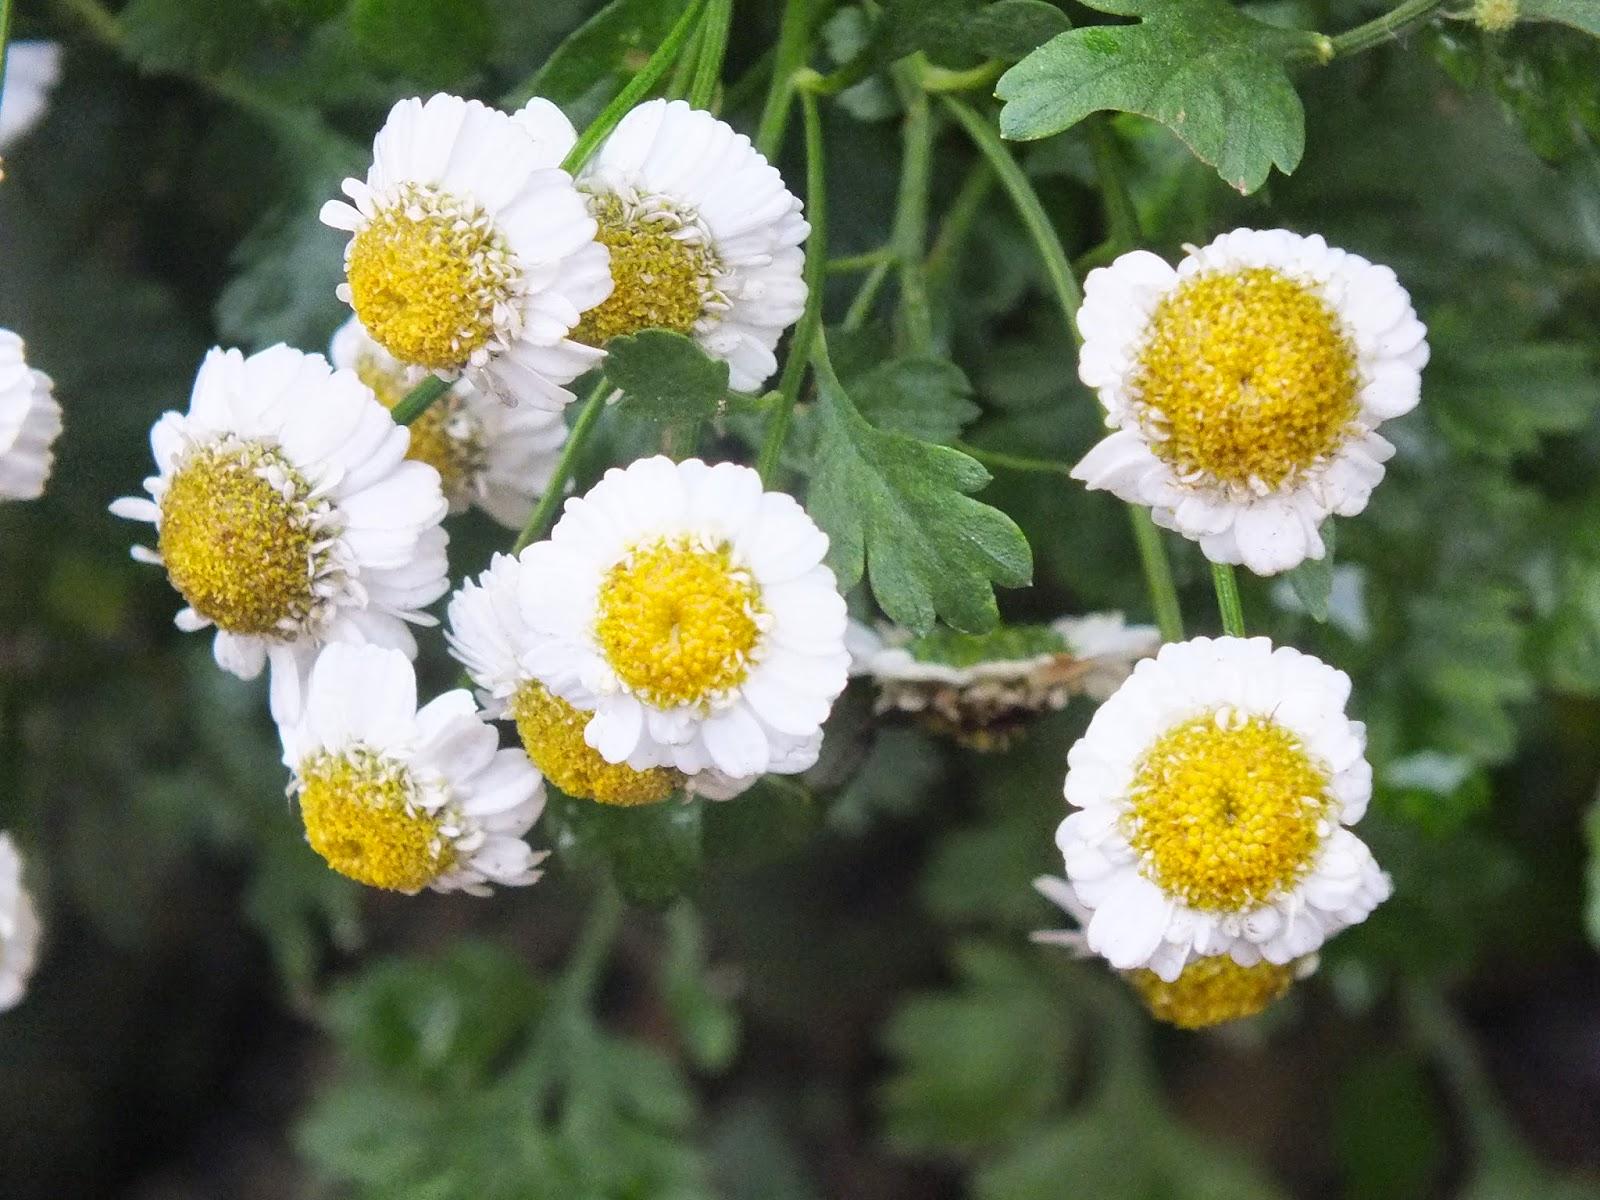 white and yellow, white and yellow flower